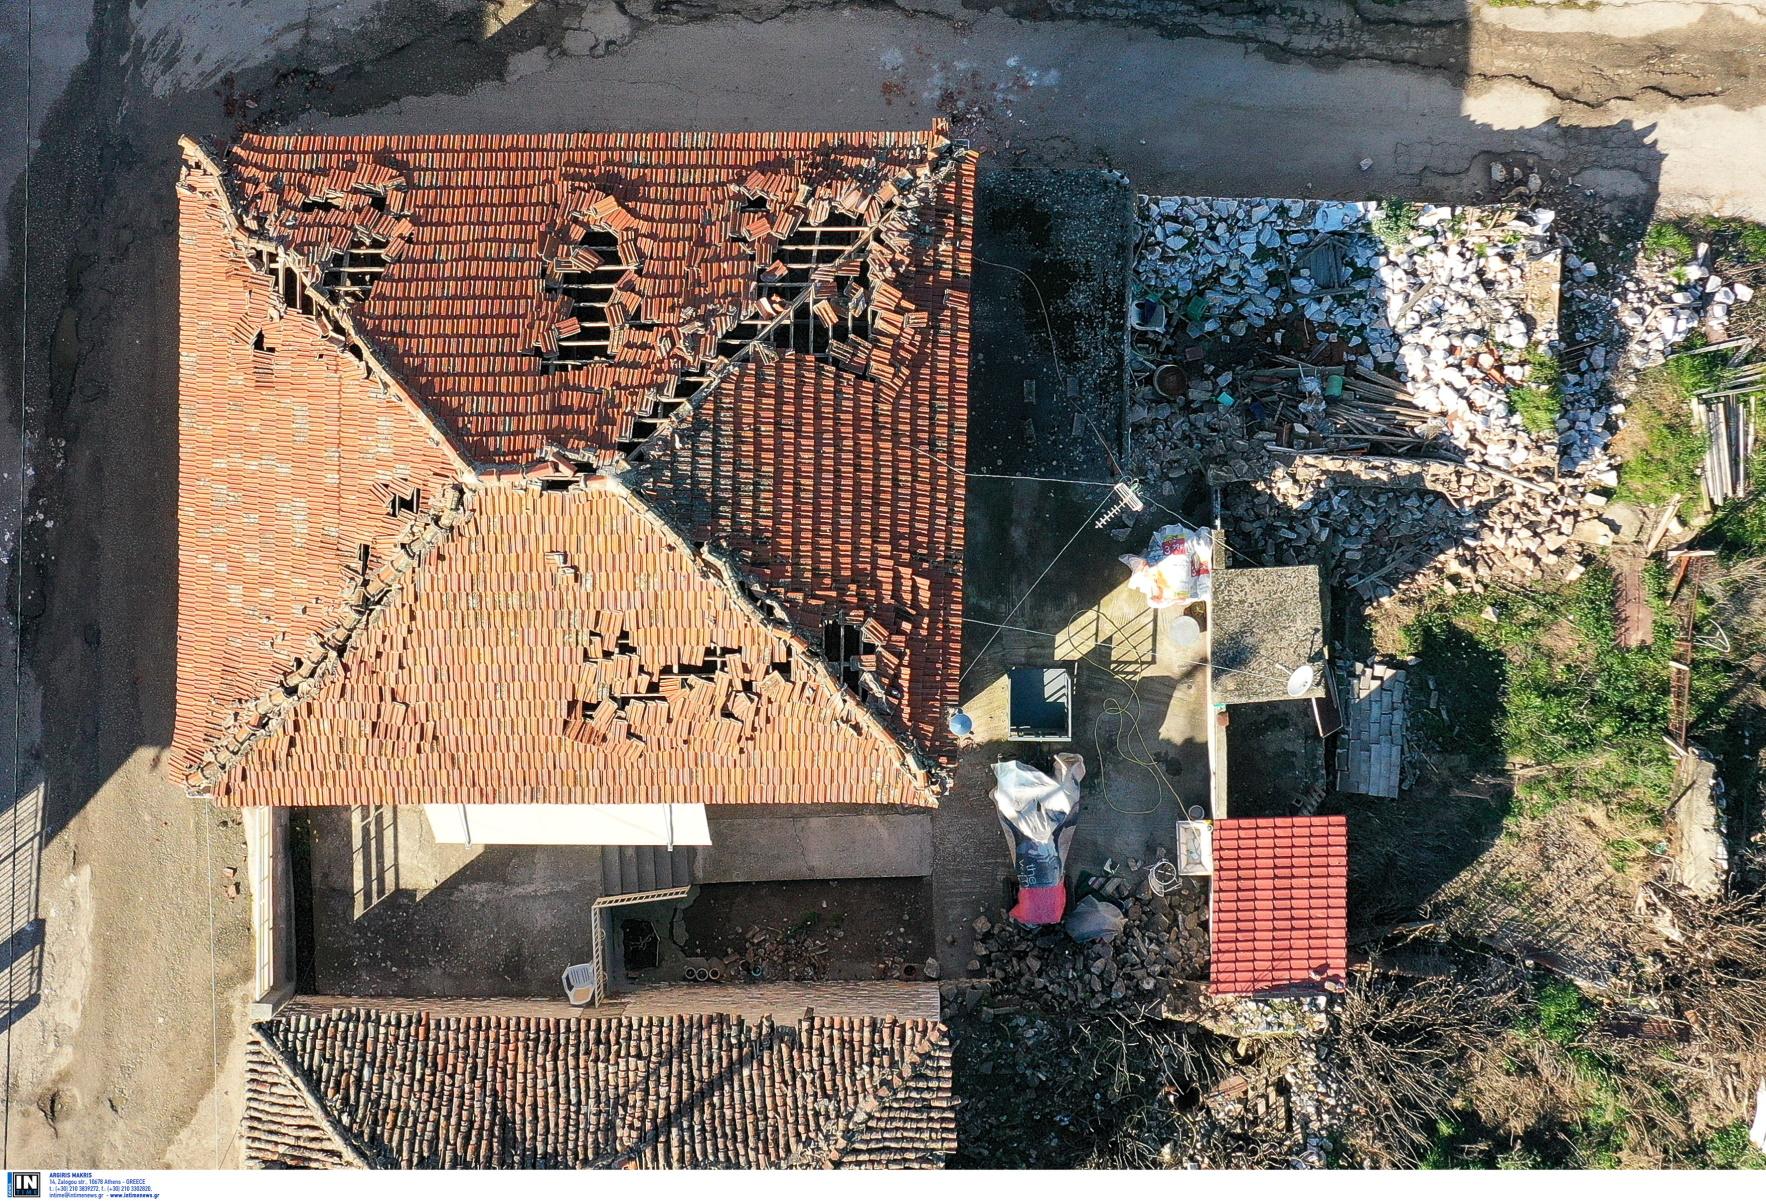 seismos Damasi 2 Intime 04 03 2021 - Δείτε από ψήλα τον σεισμό στο Δαμάσι - Εφιαλτικές περιγραφές